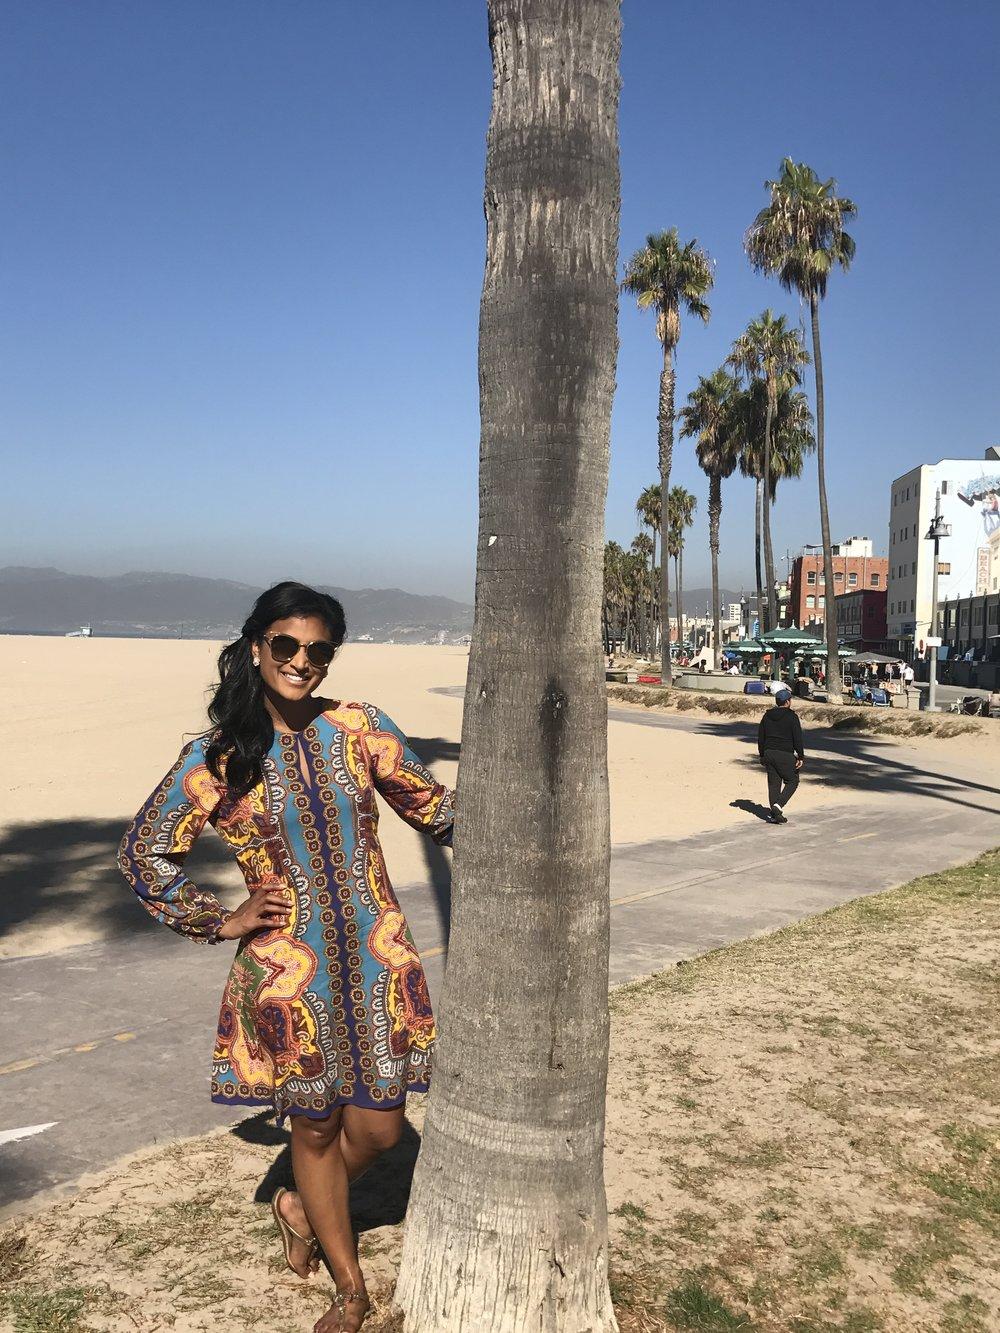 Dress: HaleBob | Sunnies: $10 found at Santa Monica street shopping 😎